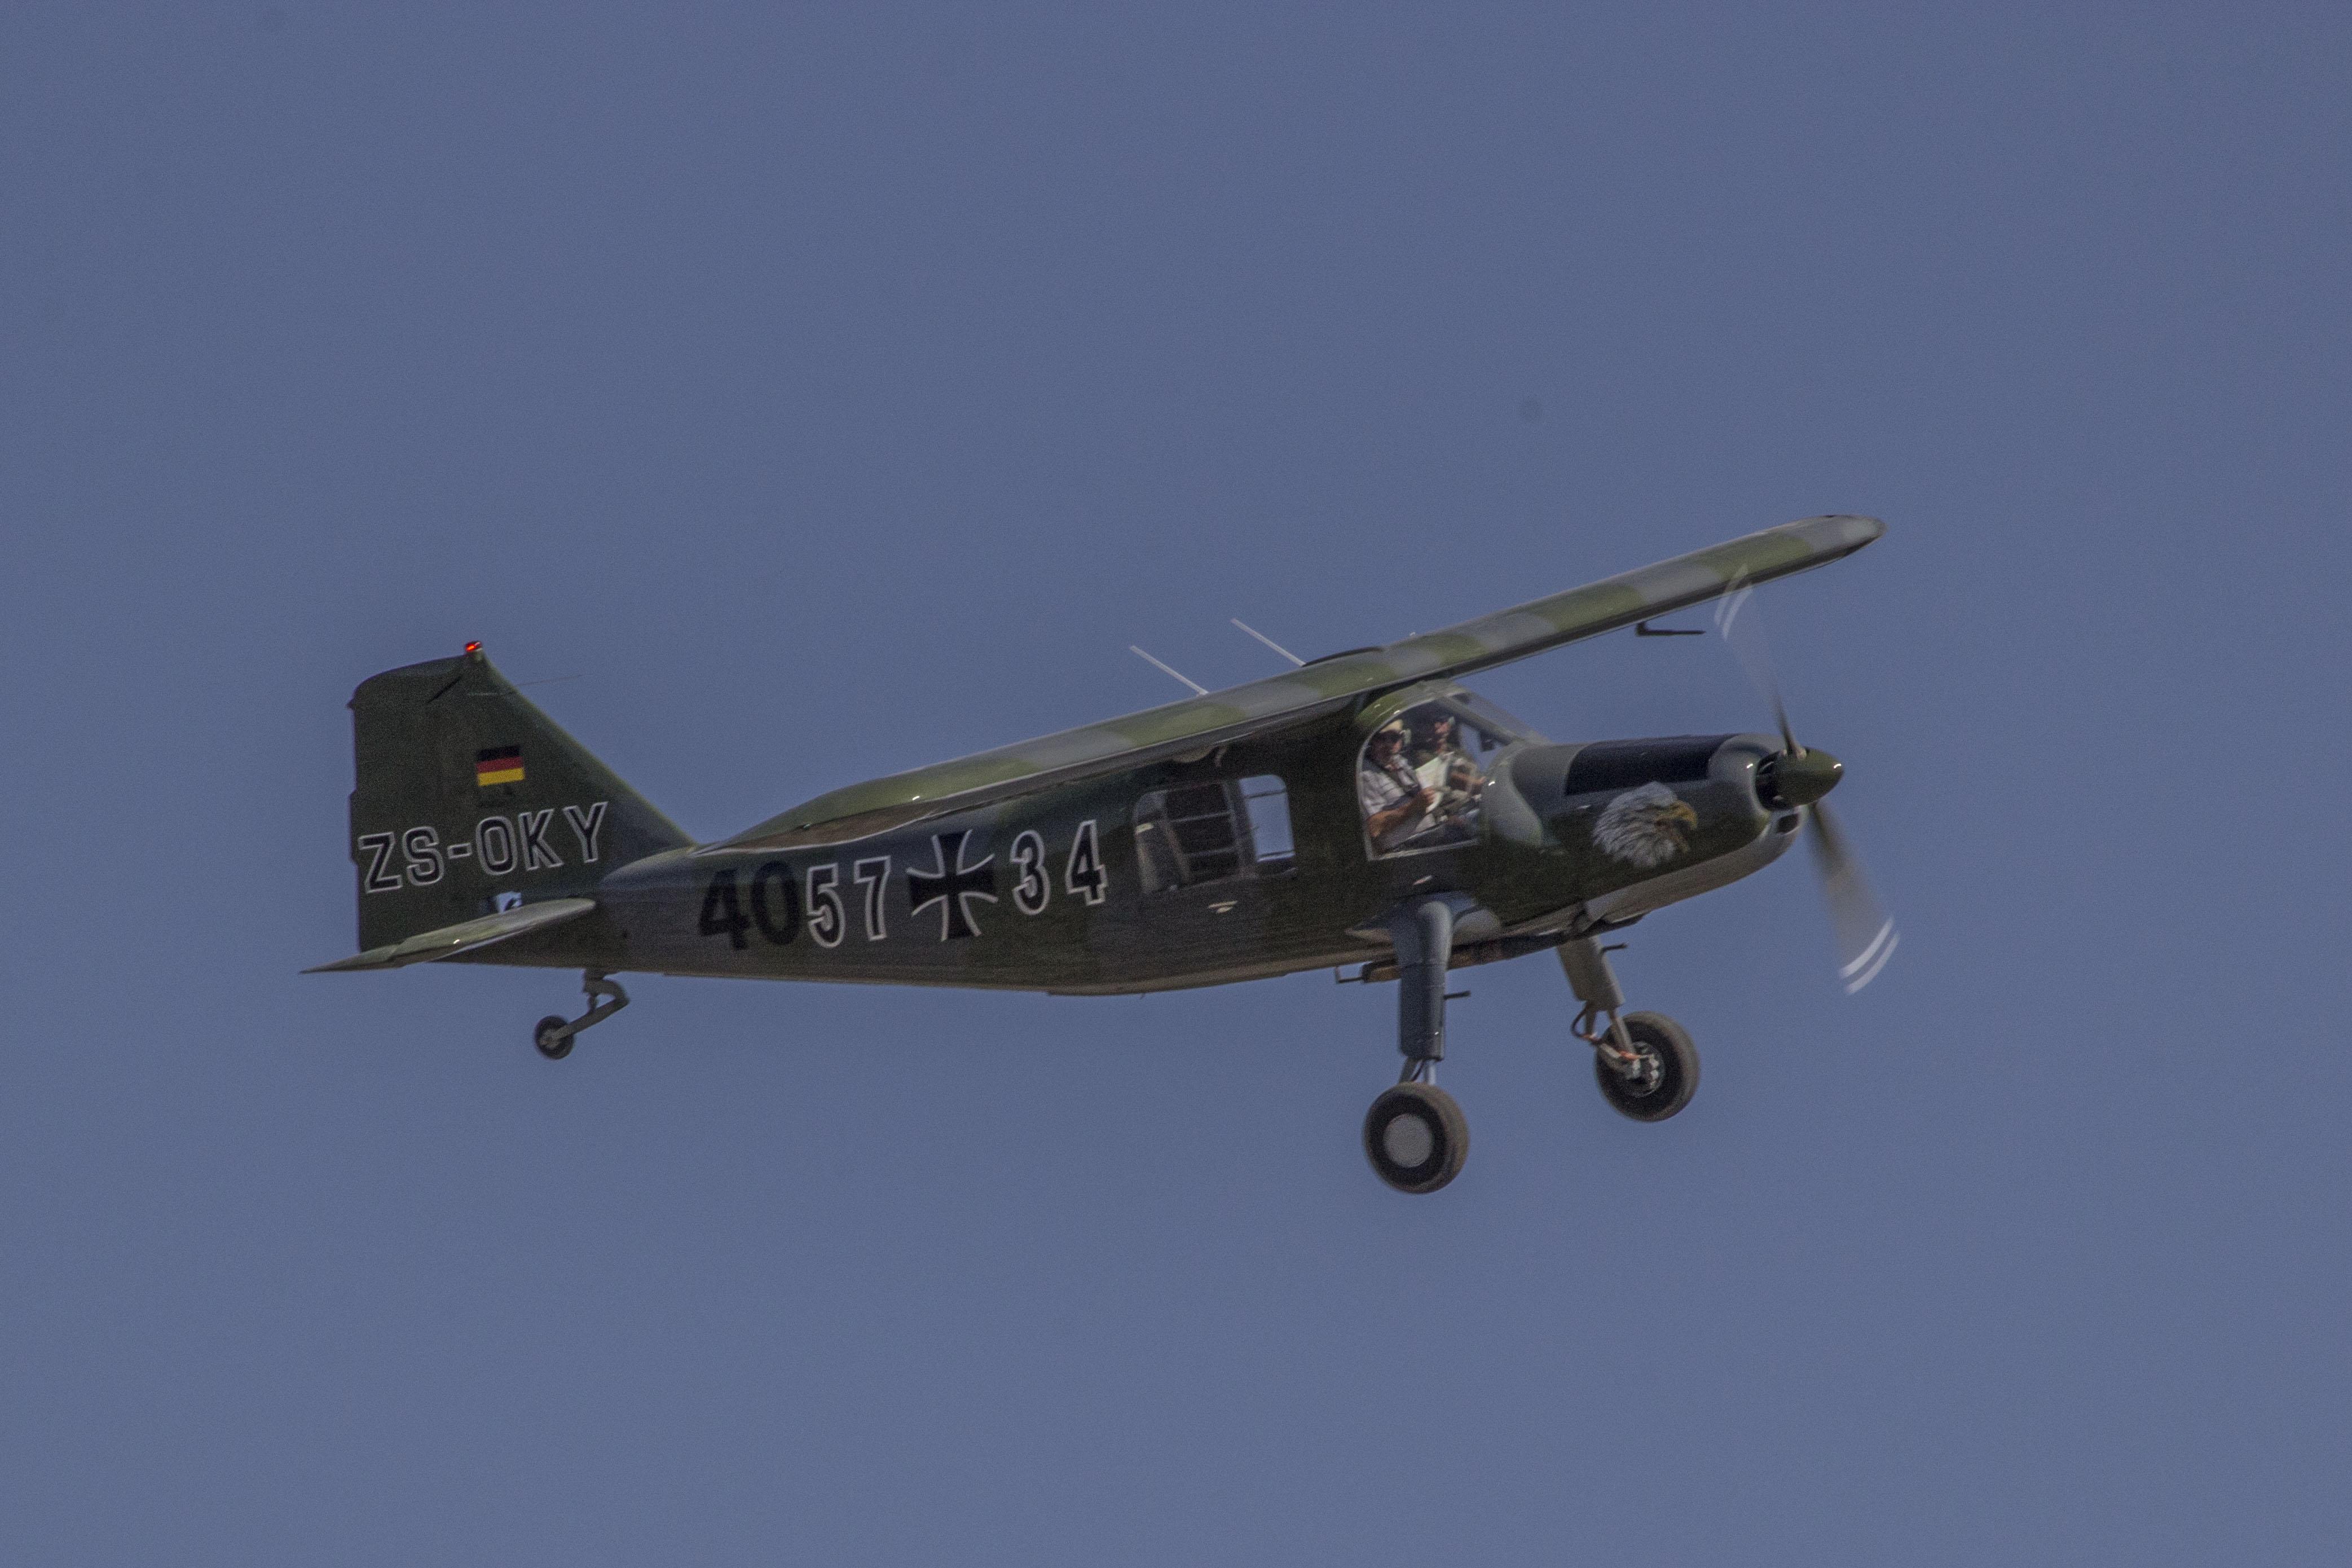 Race 40  ZS-OKY  Dornier DO27A-4  Andries van Tonder  Coenraad Underhay  Gauteng  Krugersdorp Flying Club